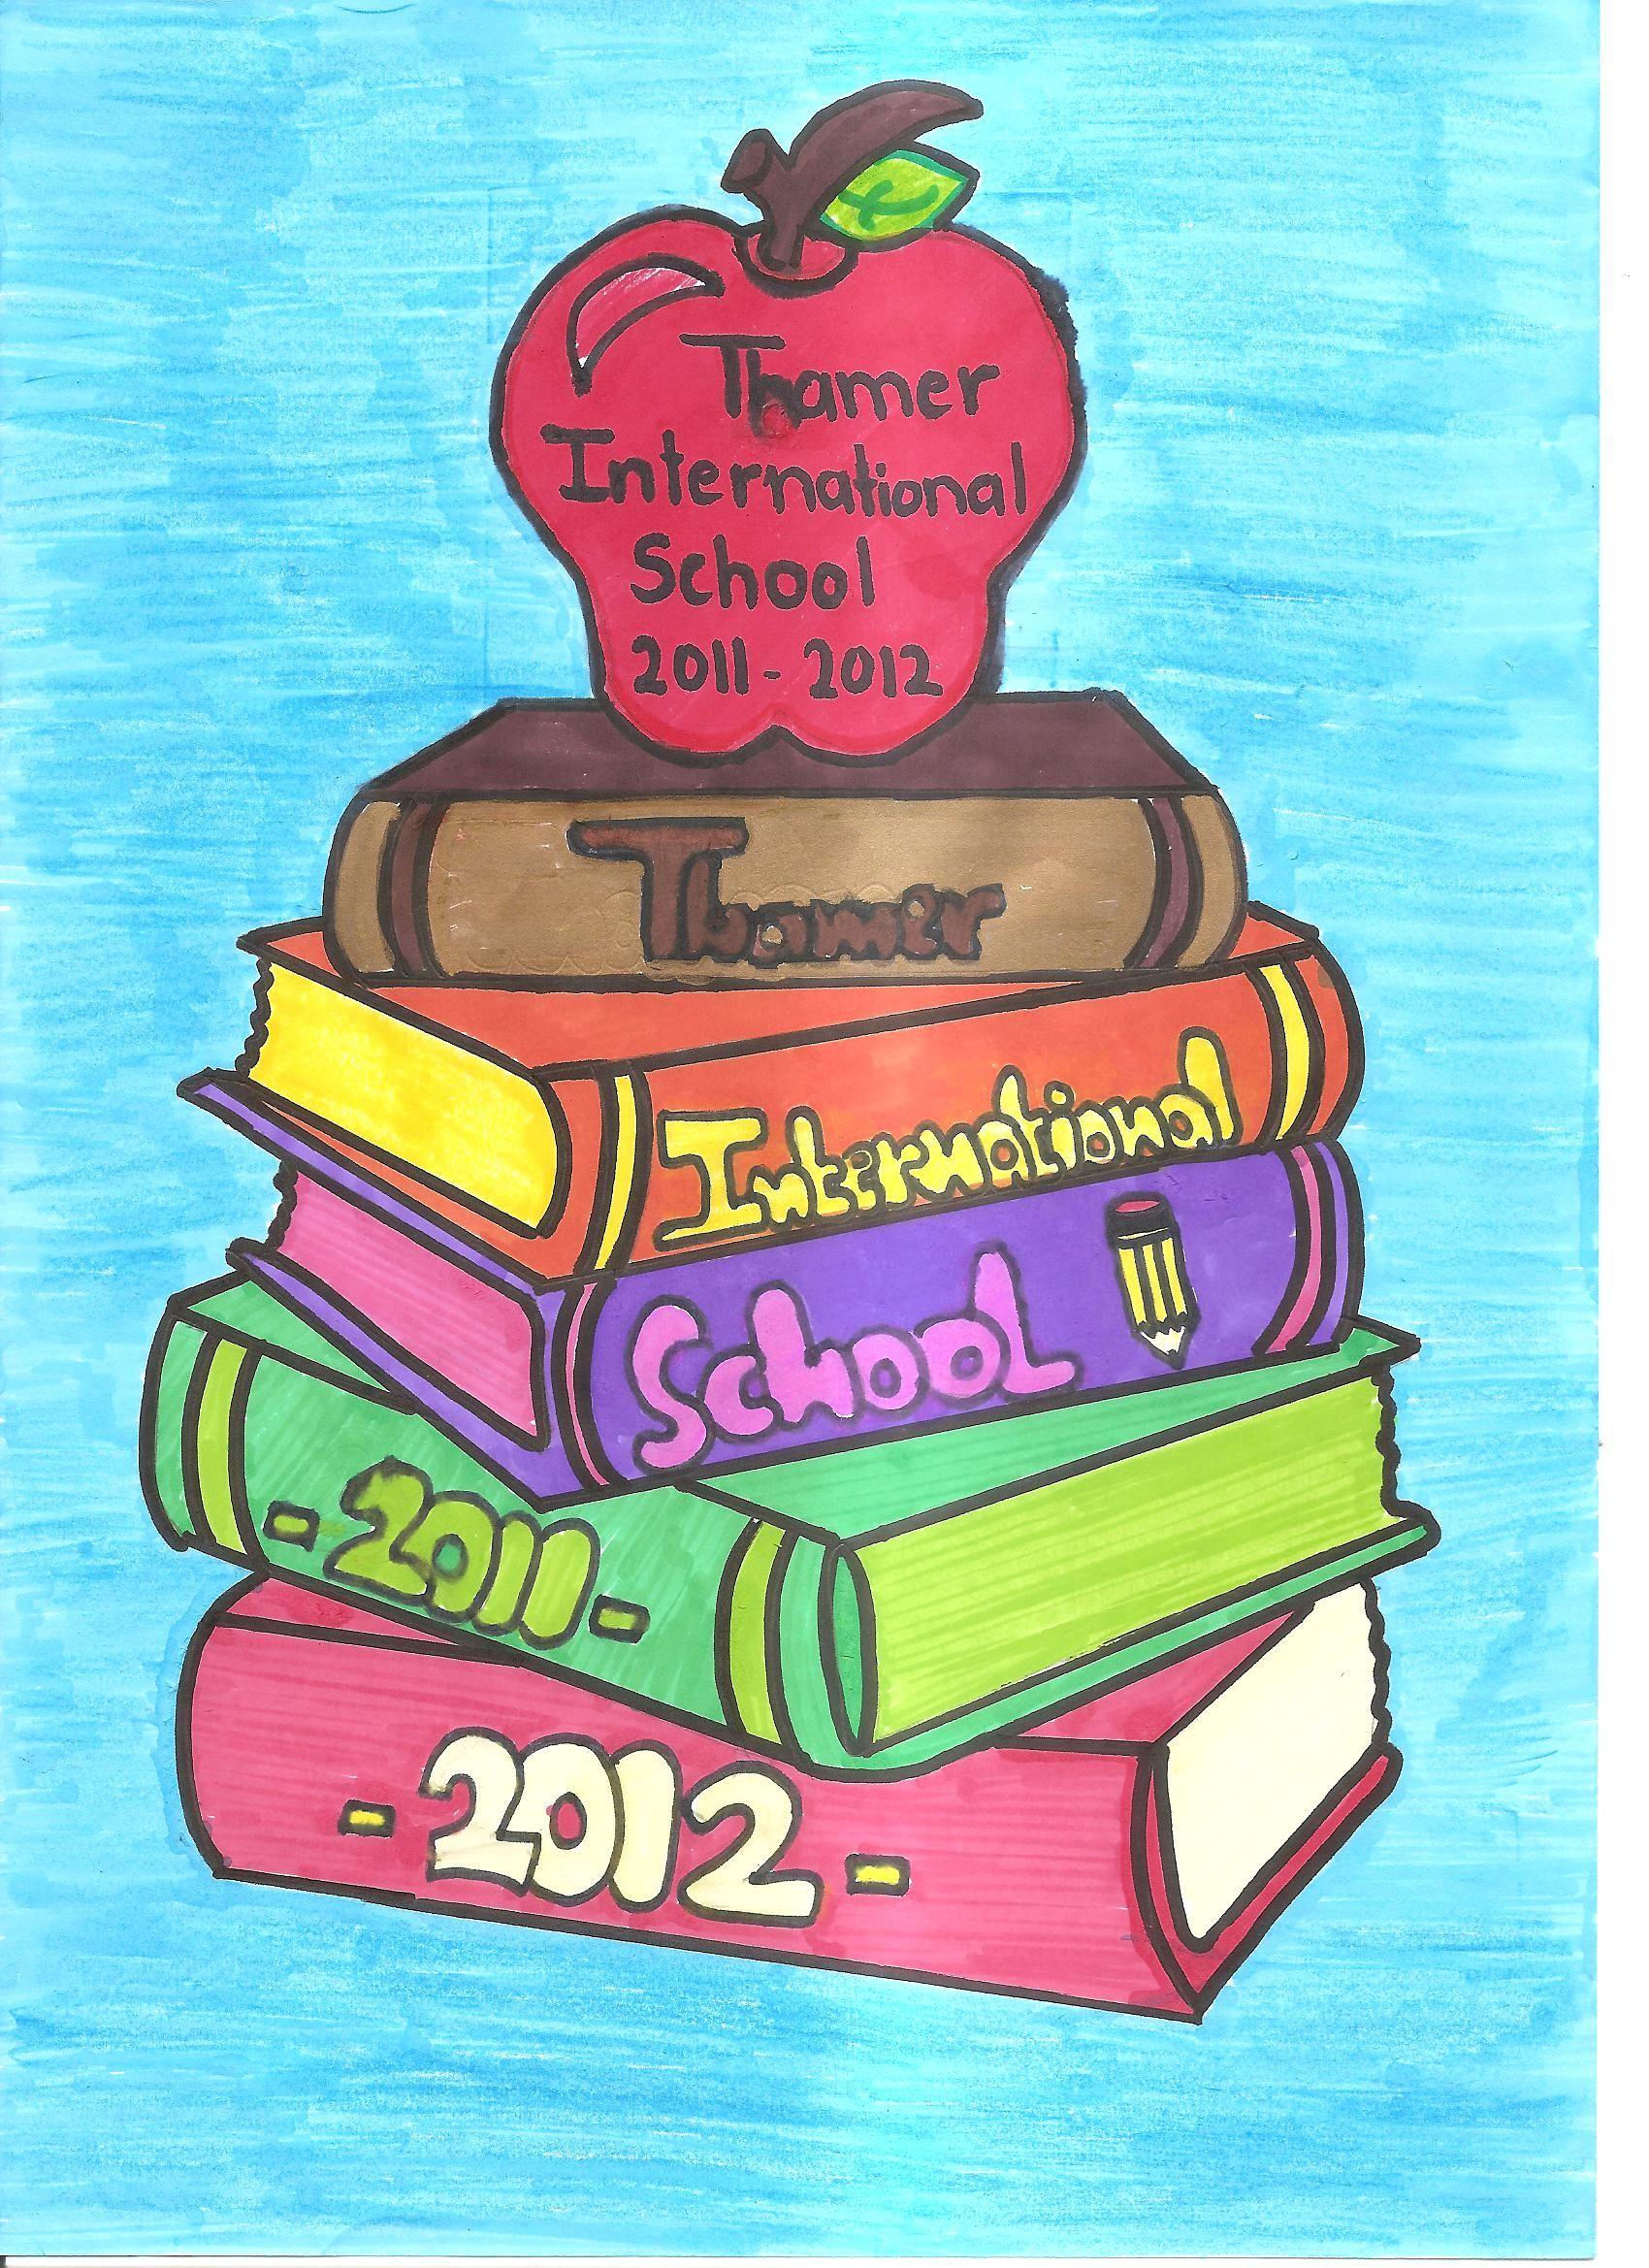 Elementary school scrapbook ideas - Yearbook Cover Google Search Yearbook Coversschool Yearbooksyearbook Ideaselementary